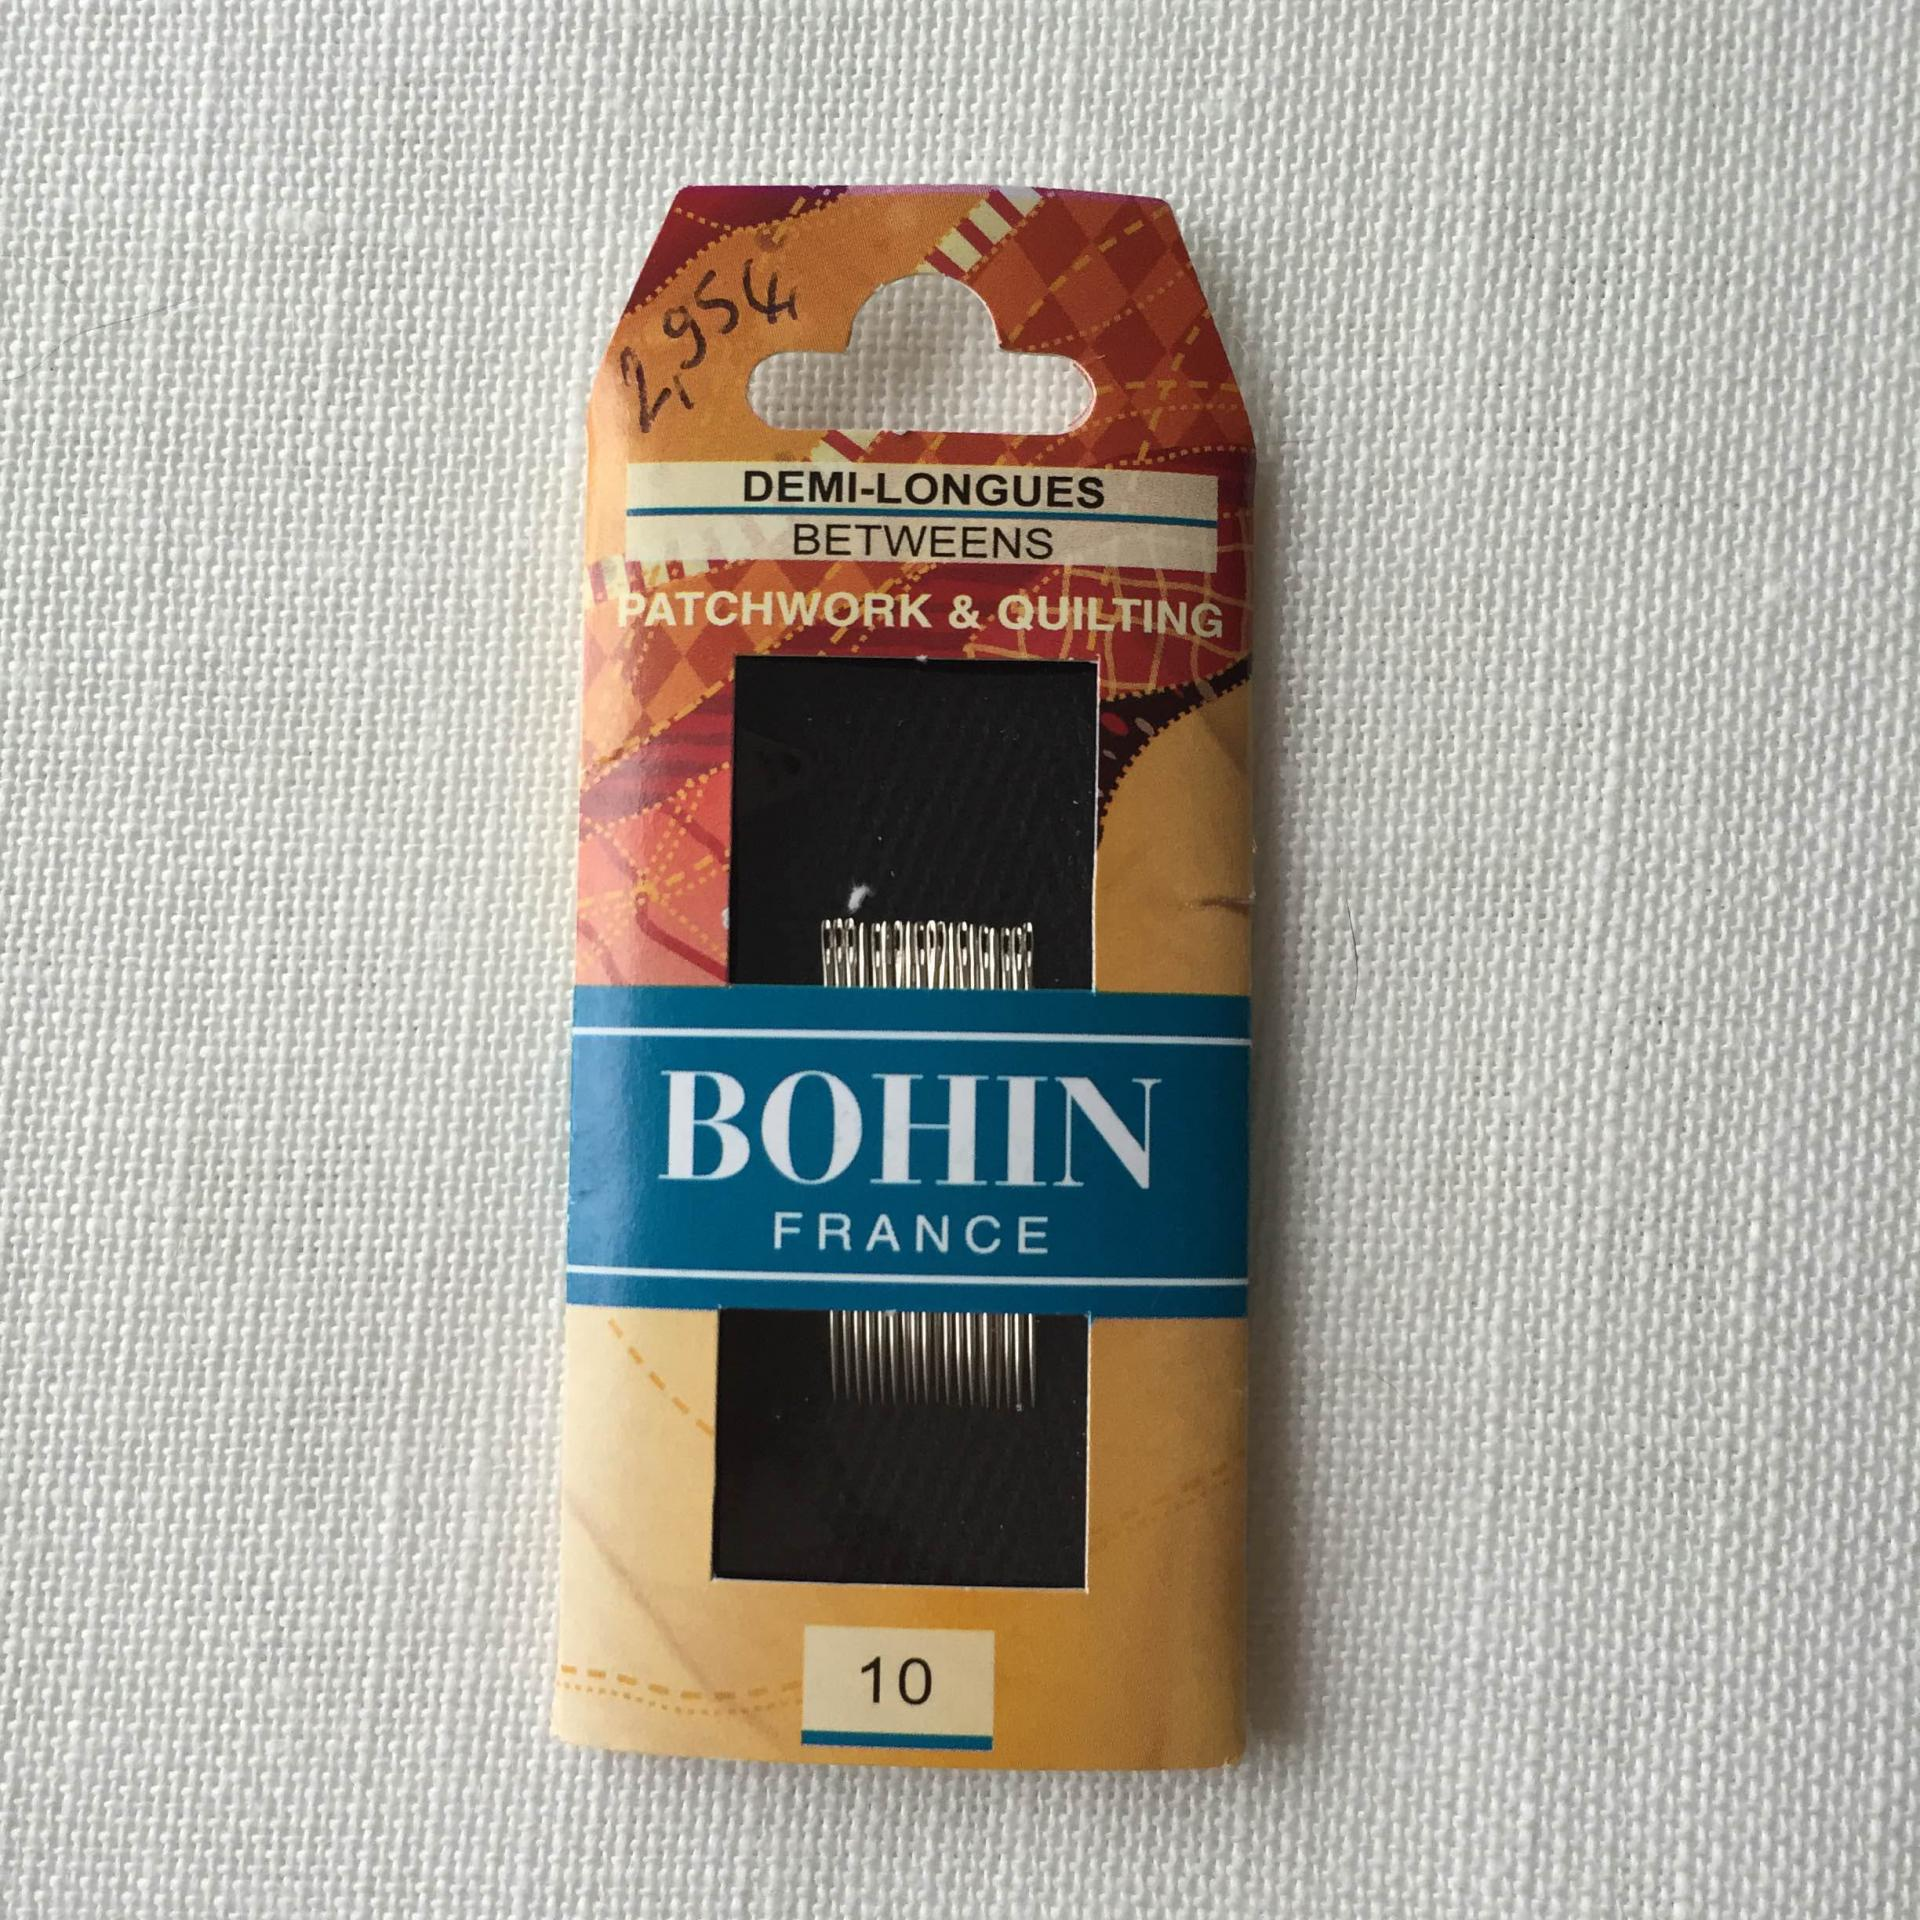 Bohin 10